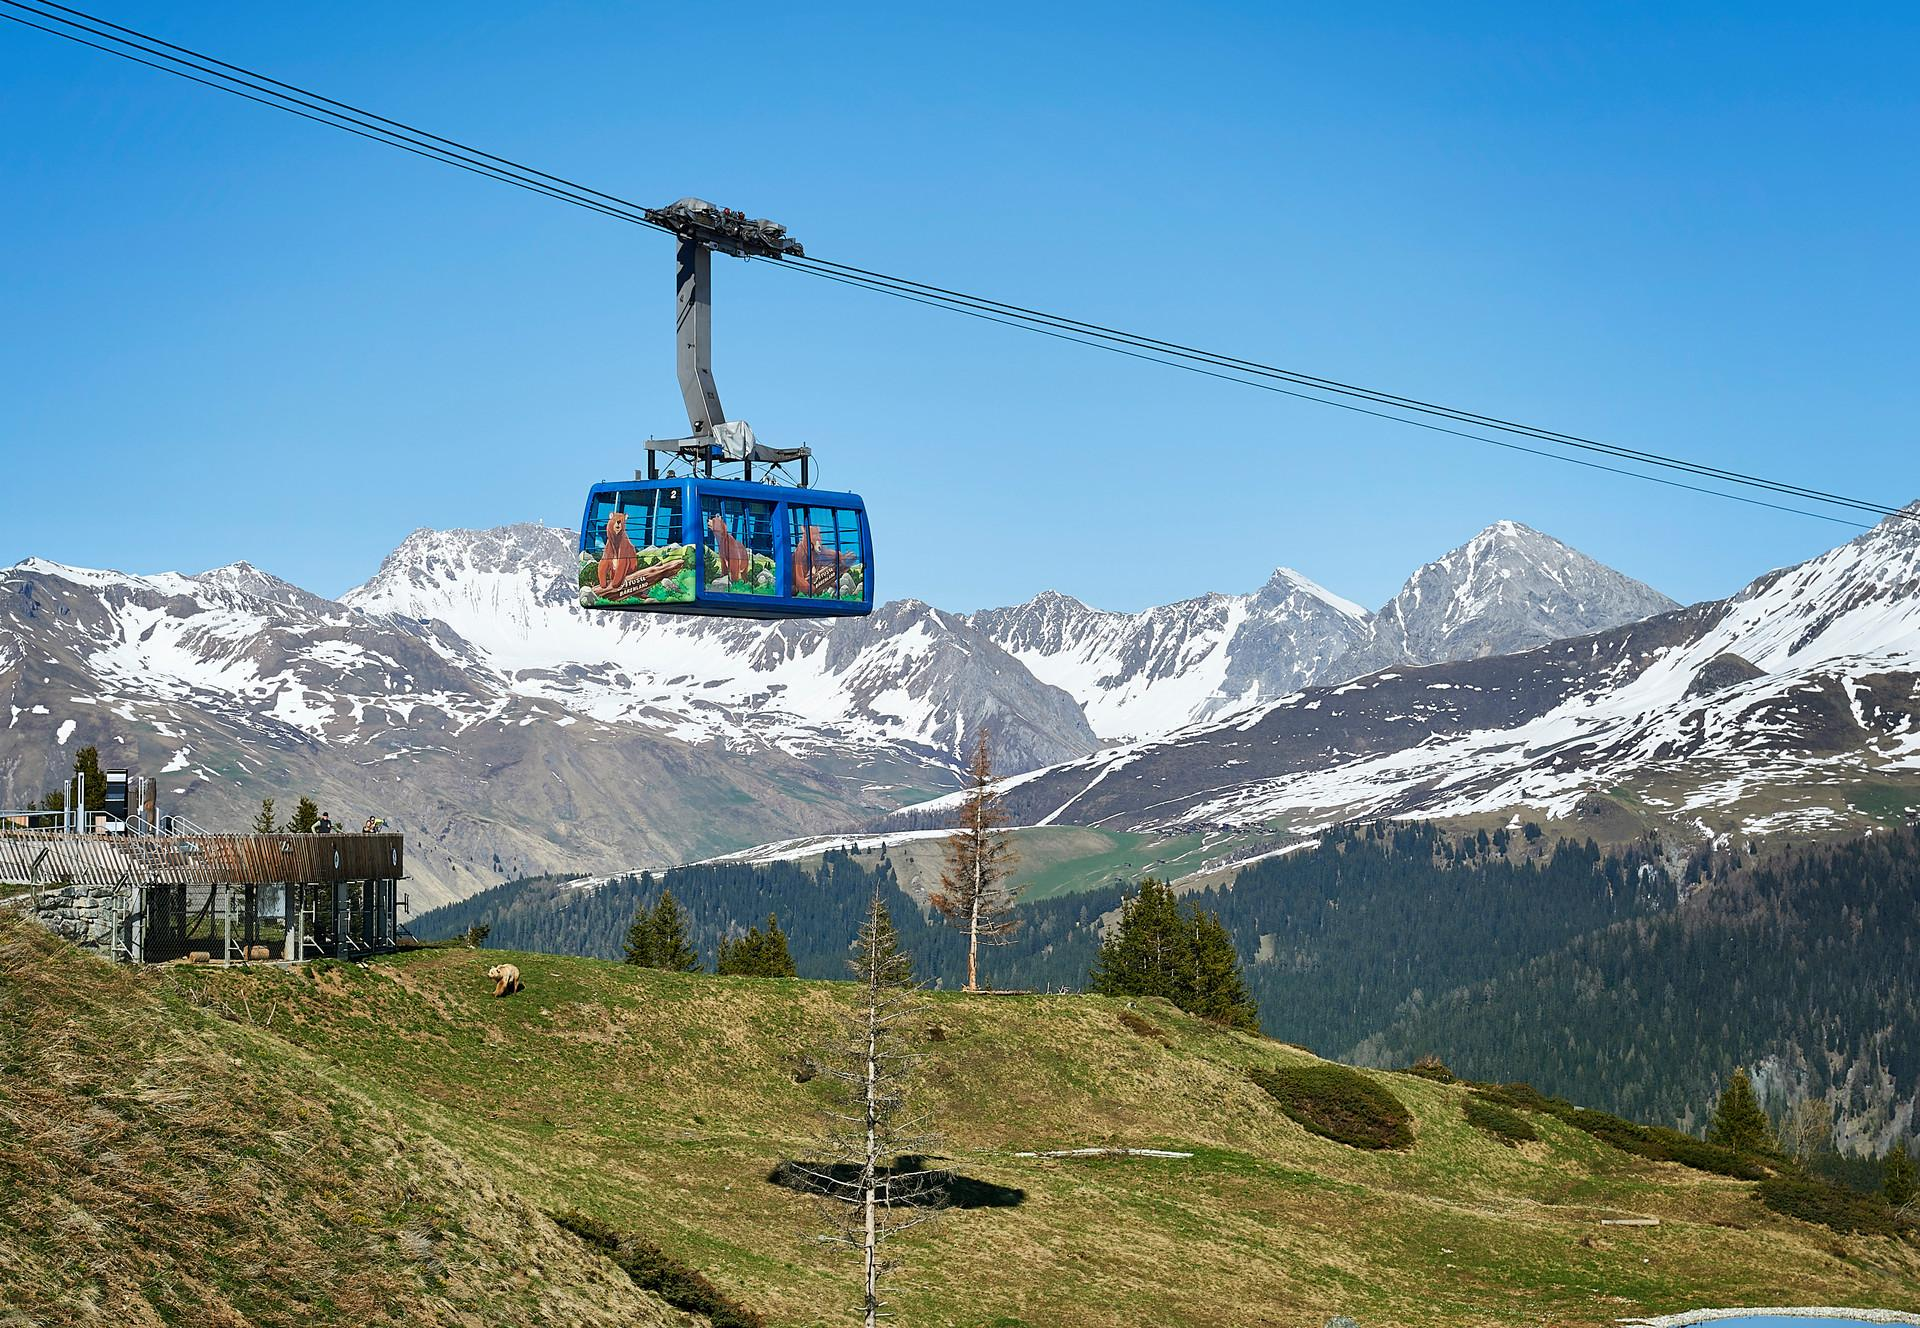 Gondola to the Arosa Bear Sanctuary